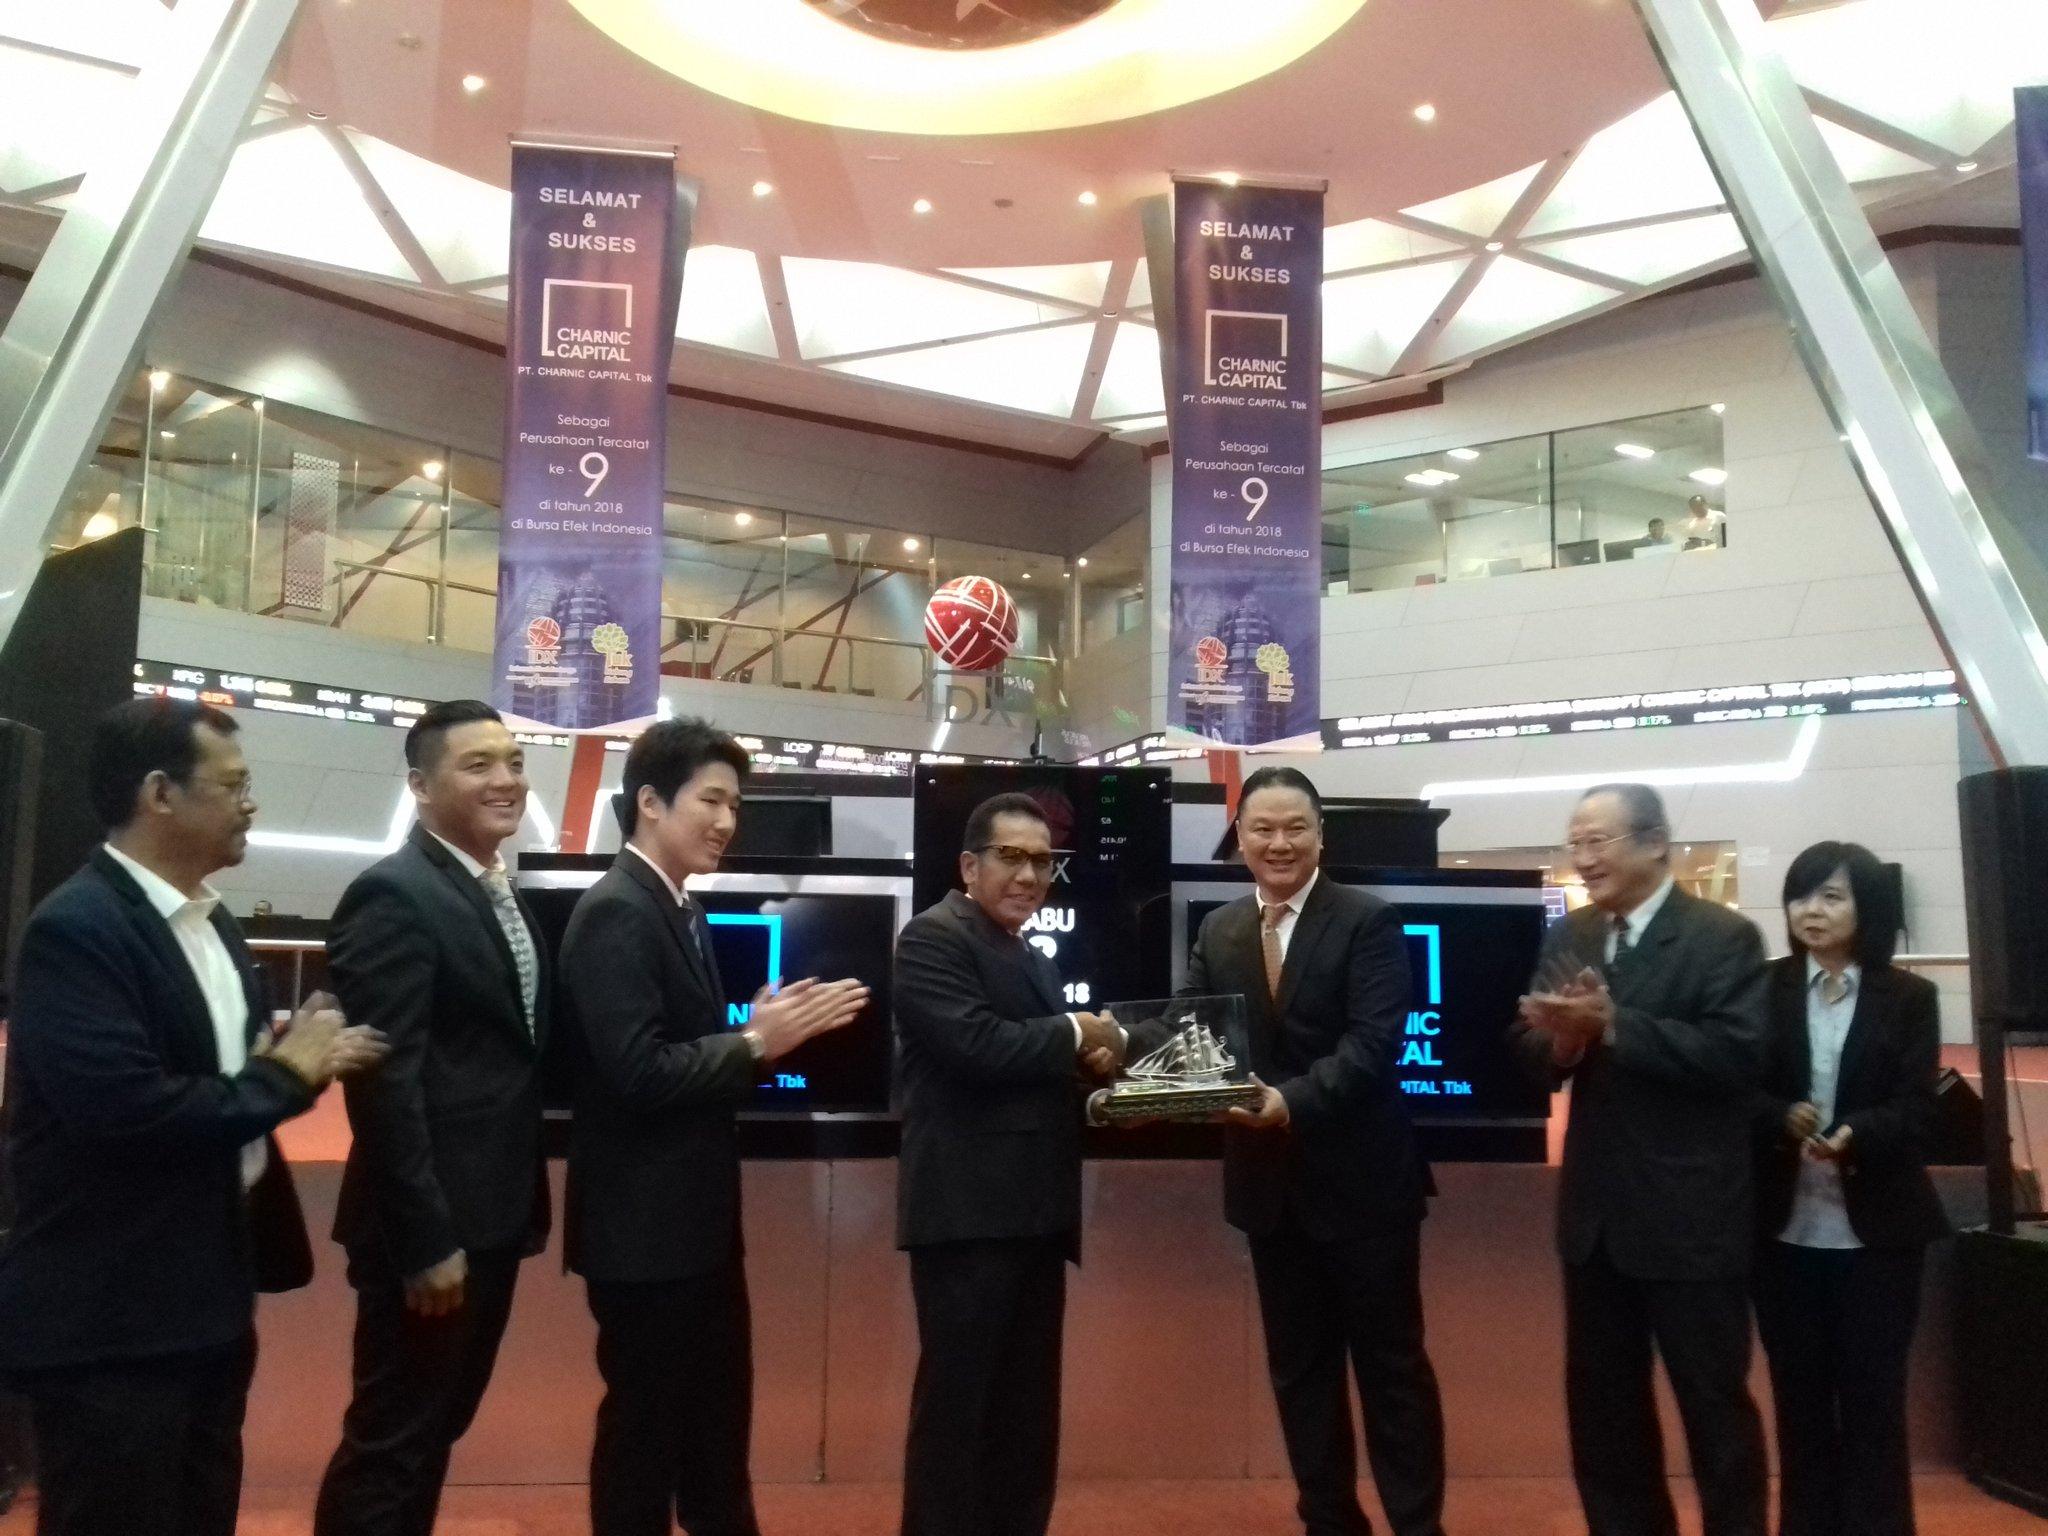 Divestasi 7,59 Juta Saham Fuji Finance (FUJI), Charnic Capital (NICK) Raup Miliaran Rupiah